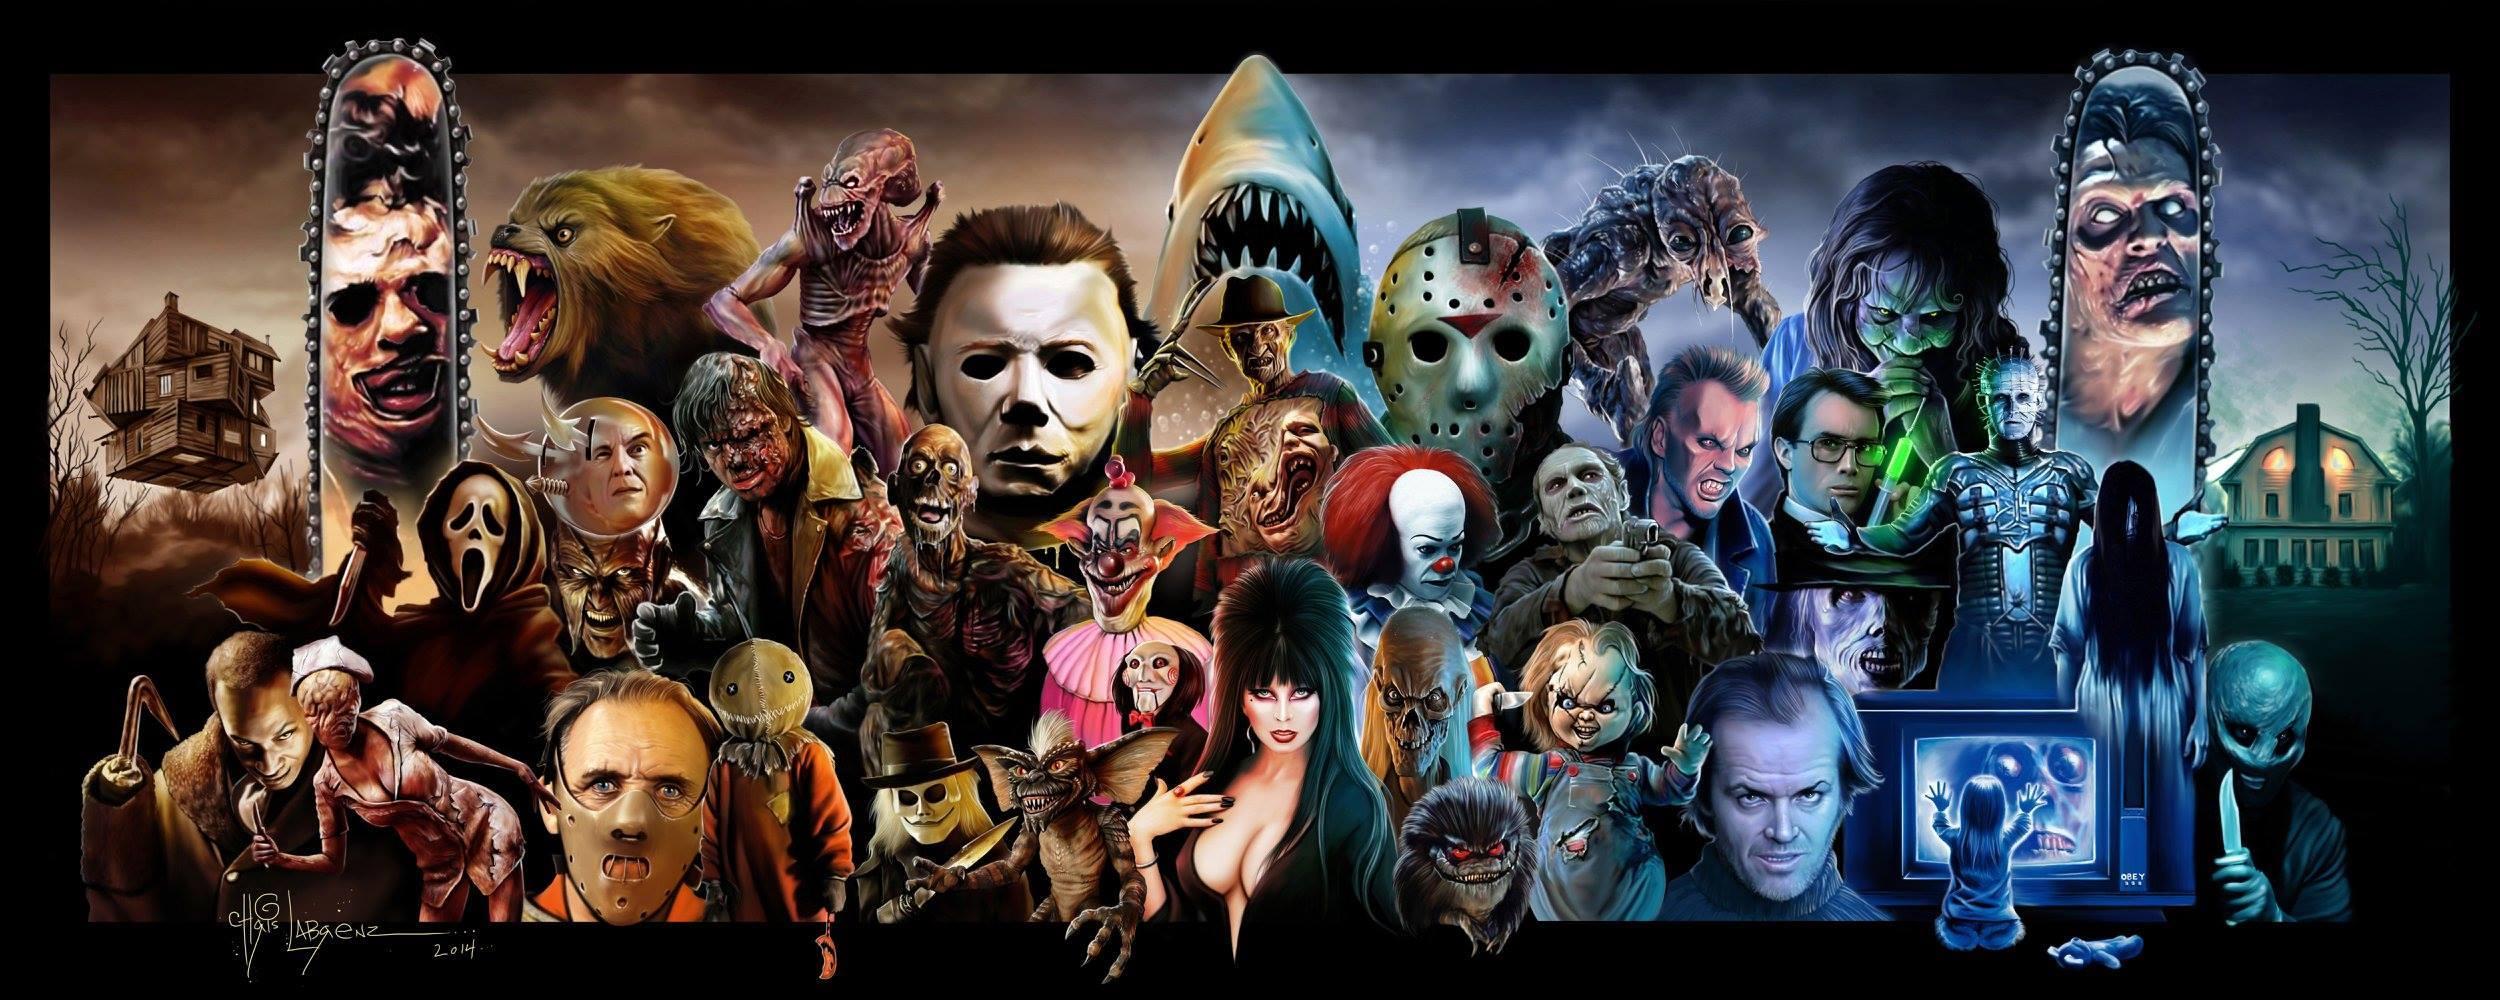 Horror Movie Icons Wallpaper - WallpaperSafari